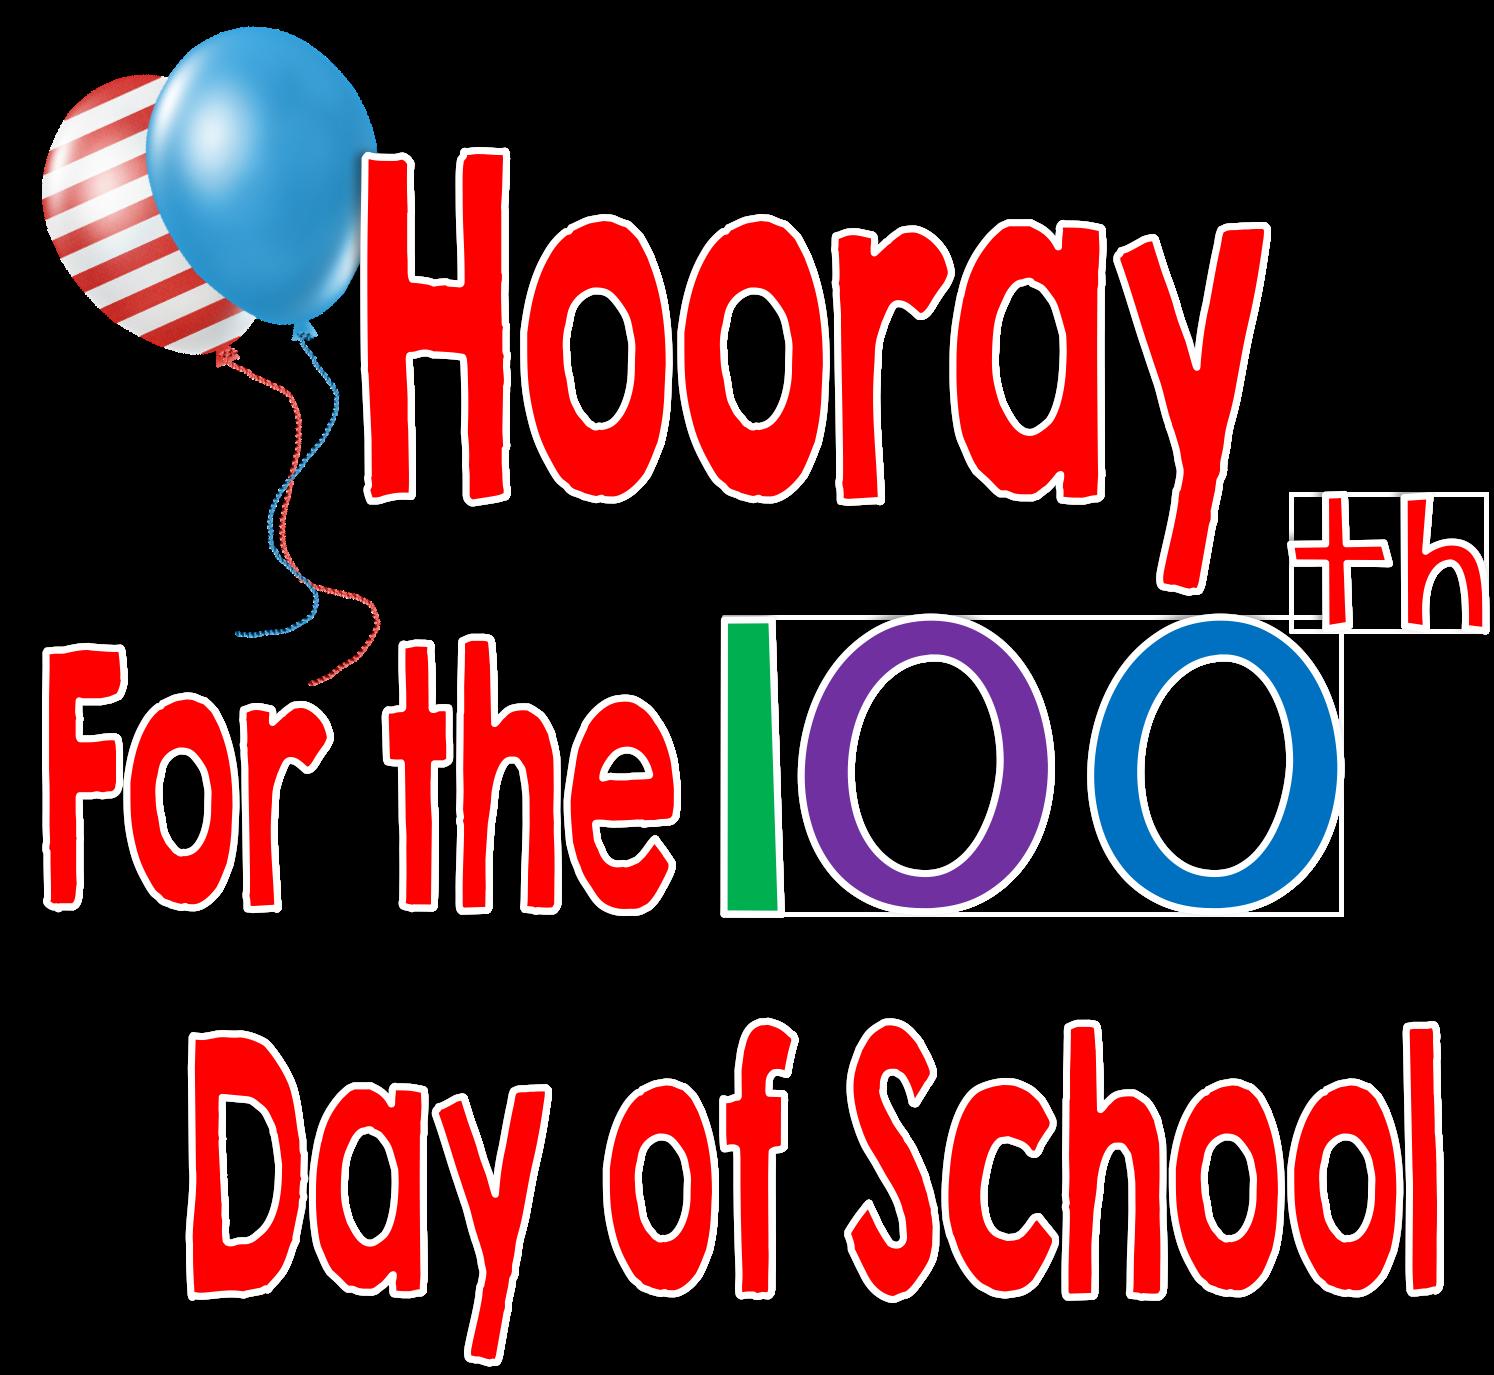 100th Day of School, Hooray!!!.